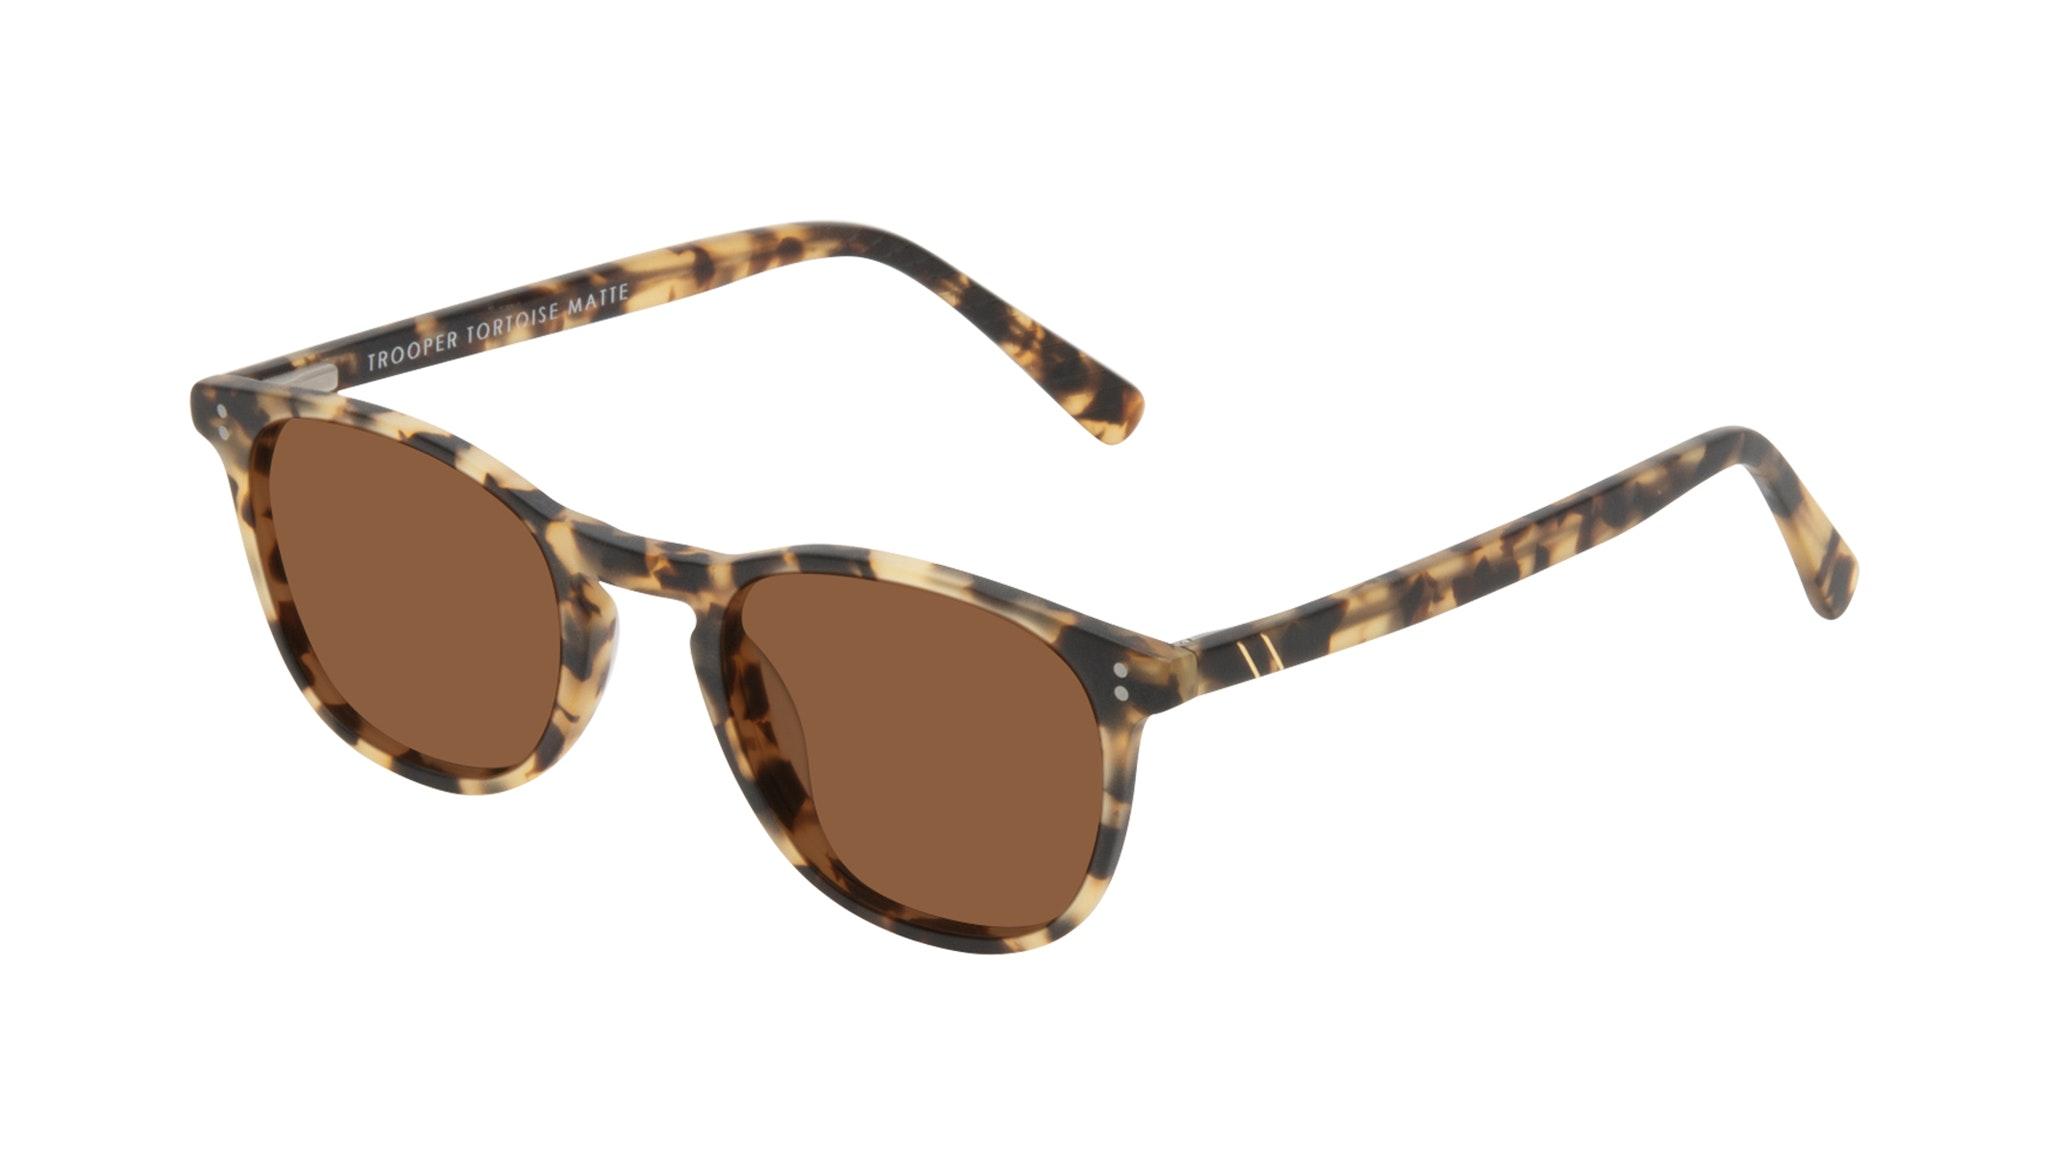 Affordable Fashion Glasses Round Sunglasses Men Trooper Tortoise Matte Tilt